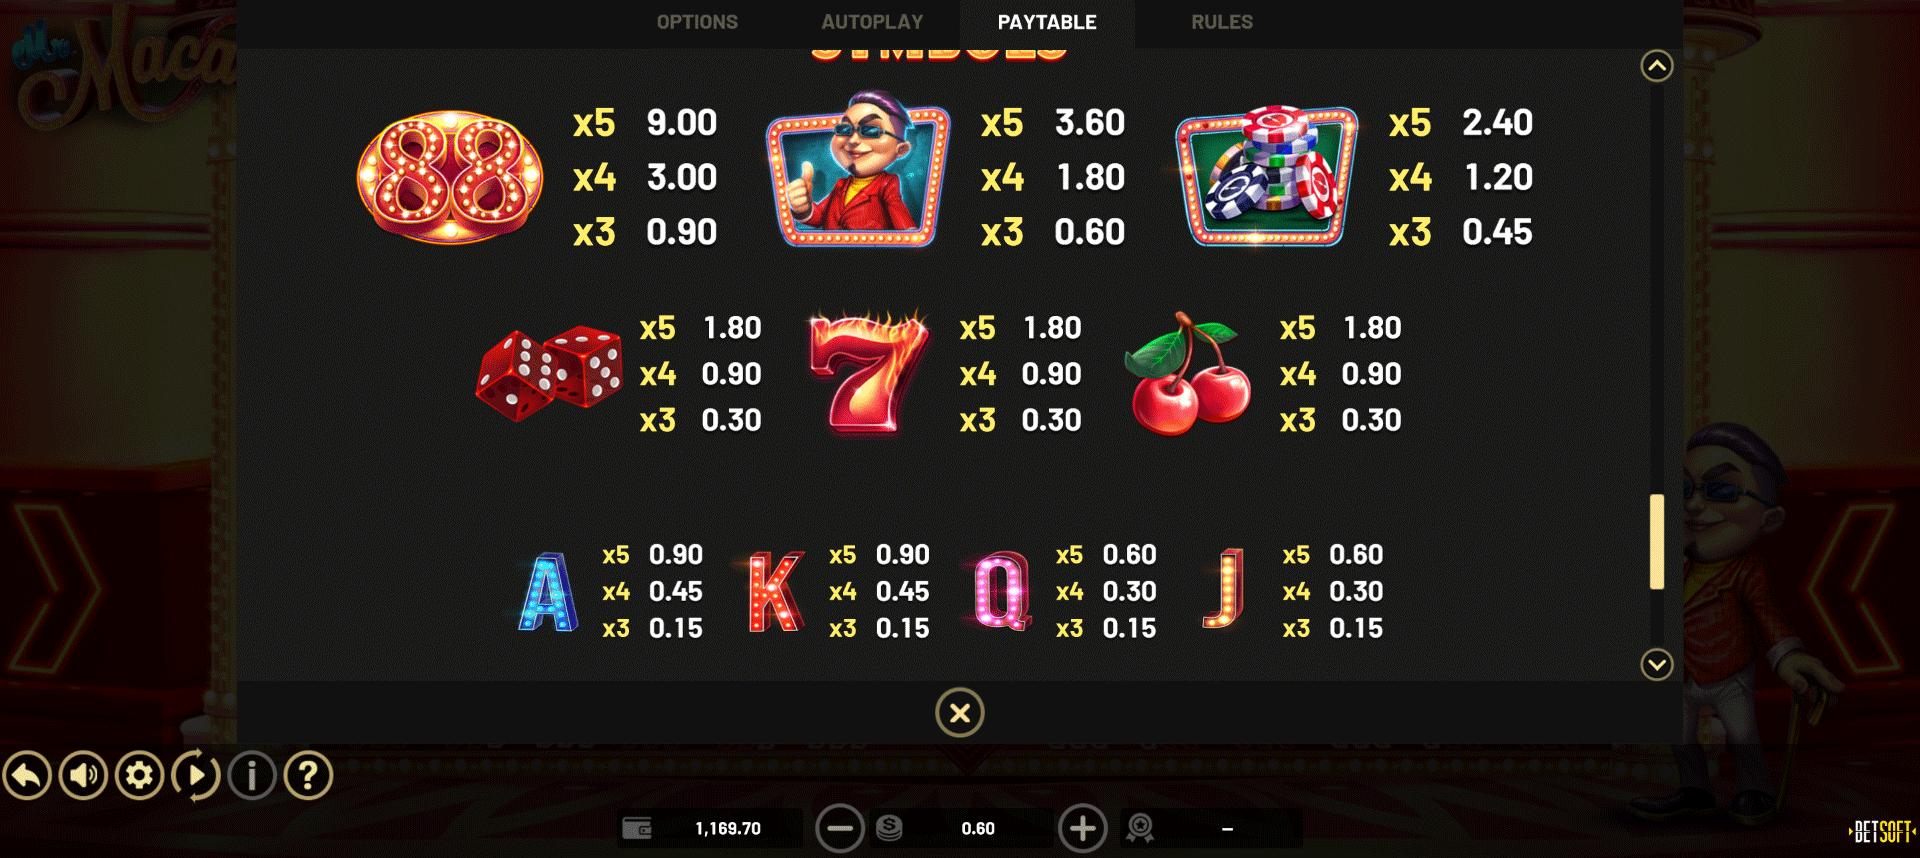 paytable della slot machine mr macau